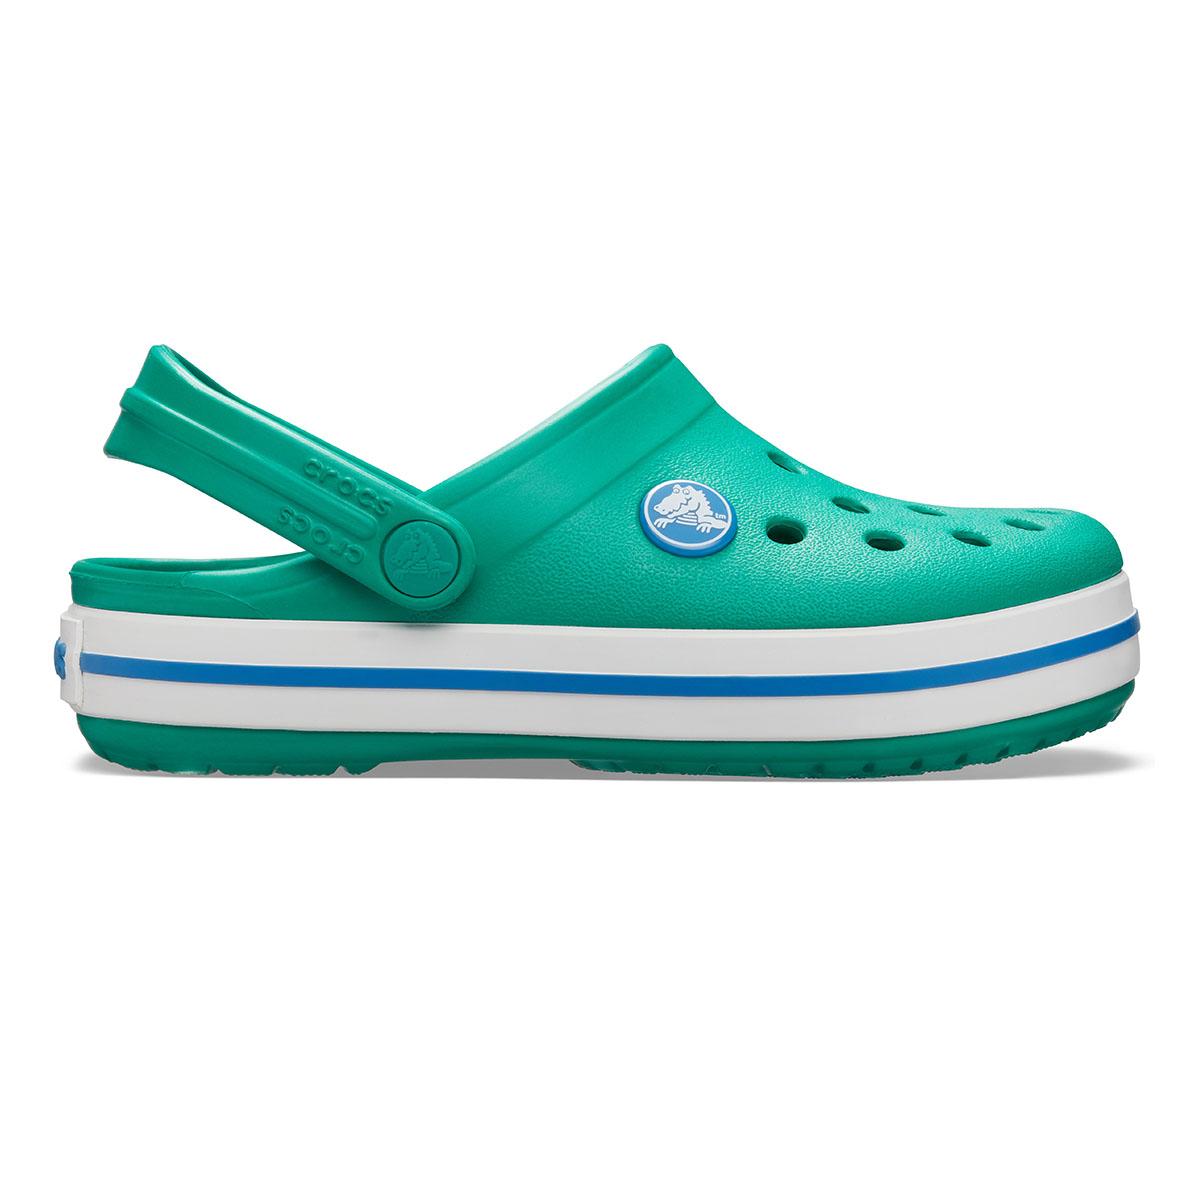 Crocband Clog K-Koyu Yeşi/Mavi